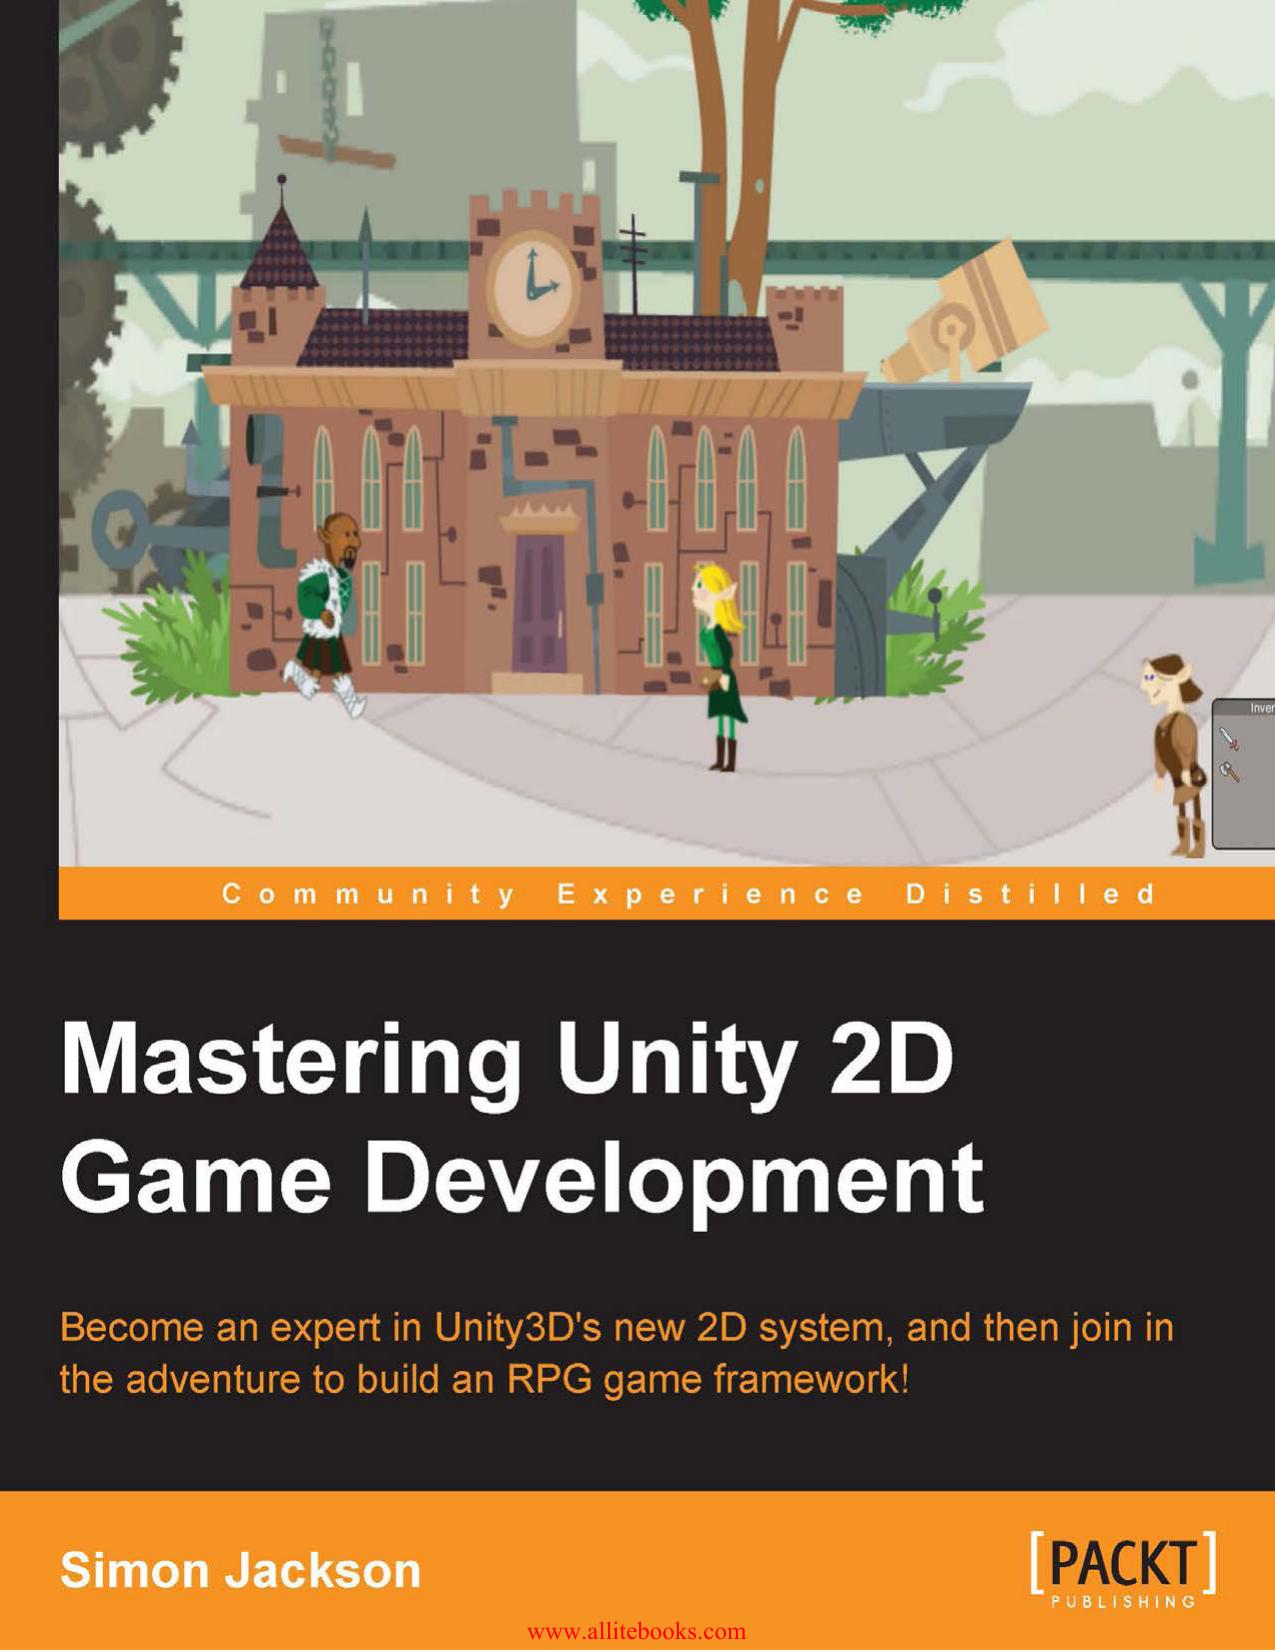 Mastering Unity 2D Game Development | manualzz com